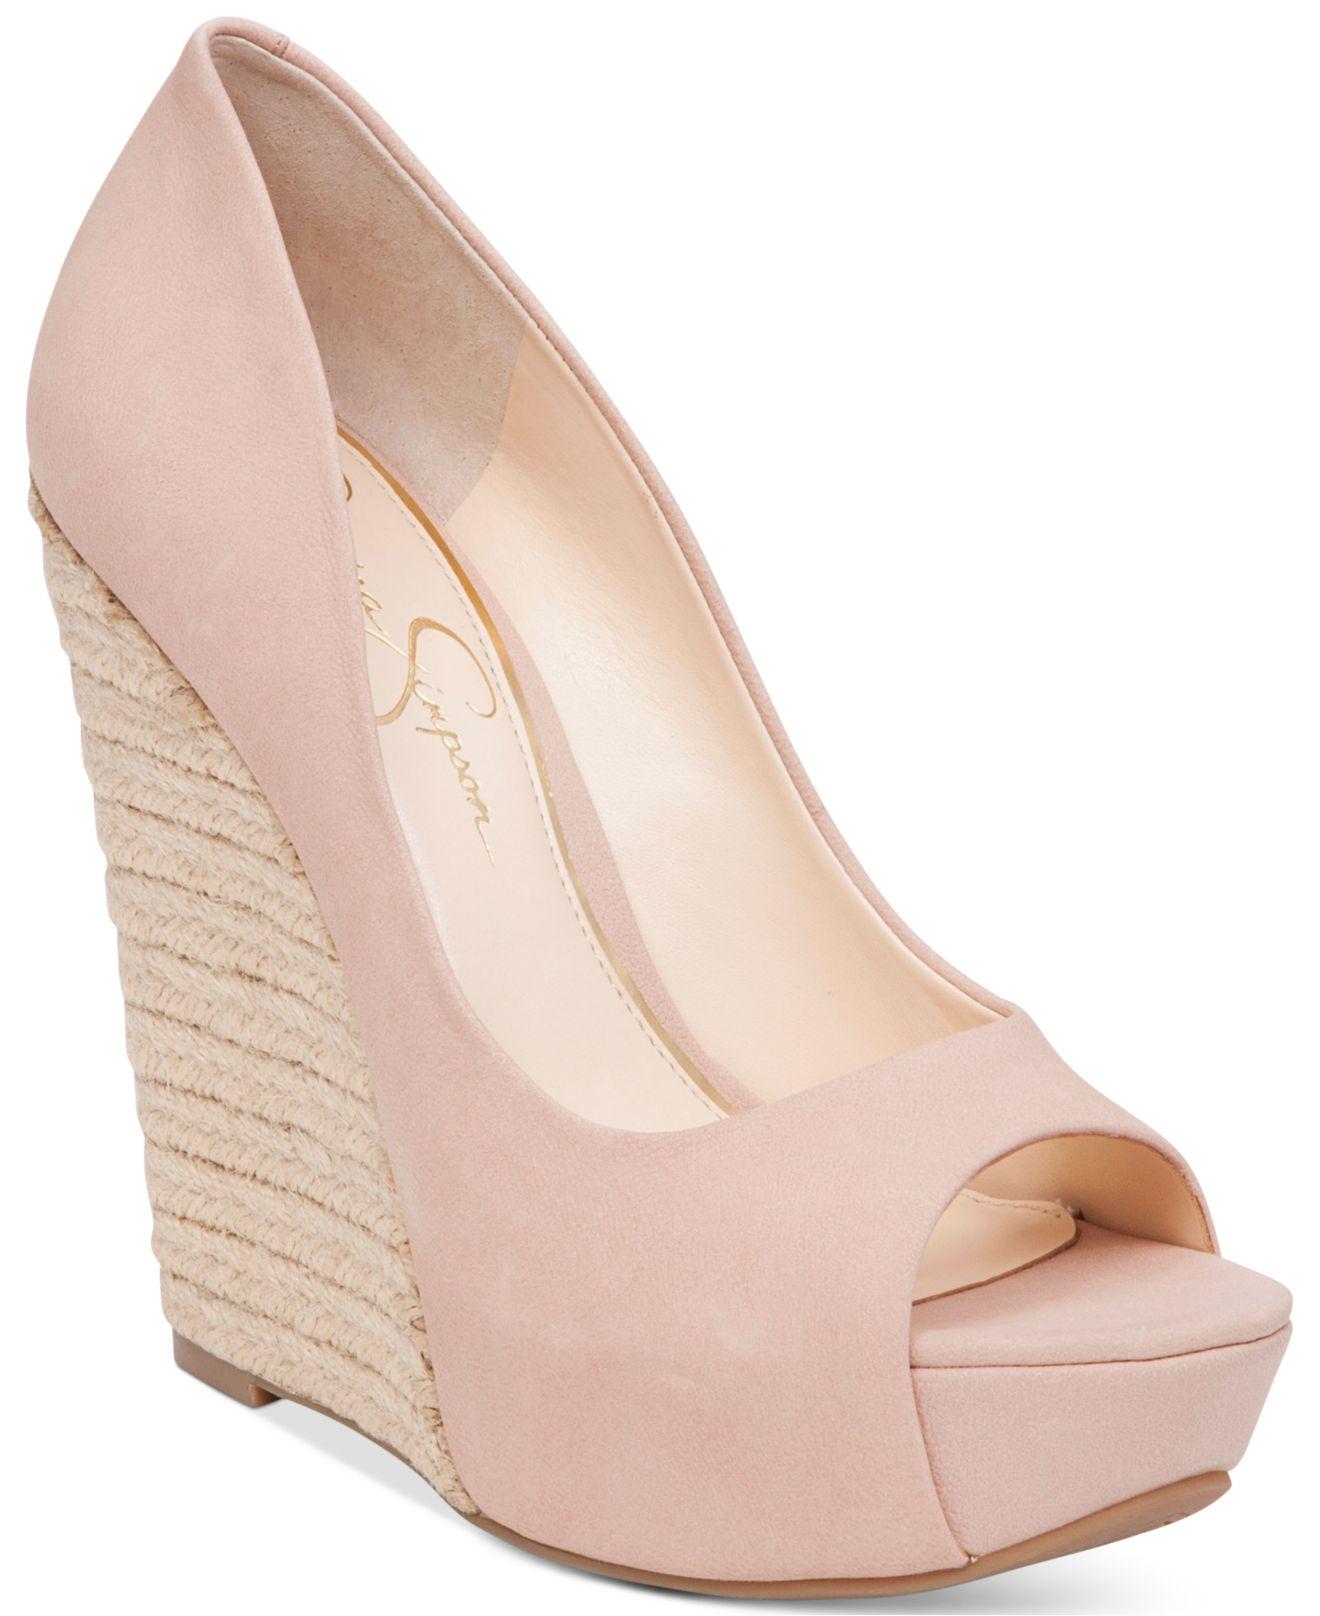 Jessica simpson Bethani Peep-toe Platform Wedge Pumps in Pink | Lyst